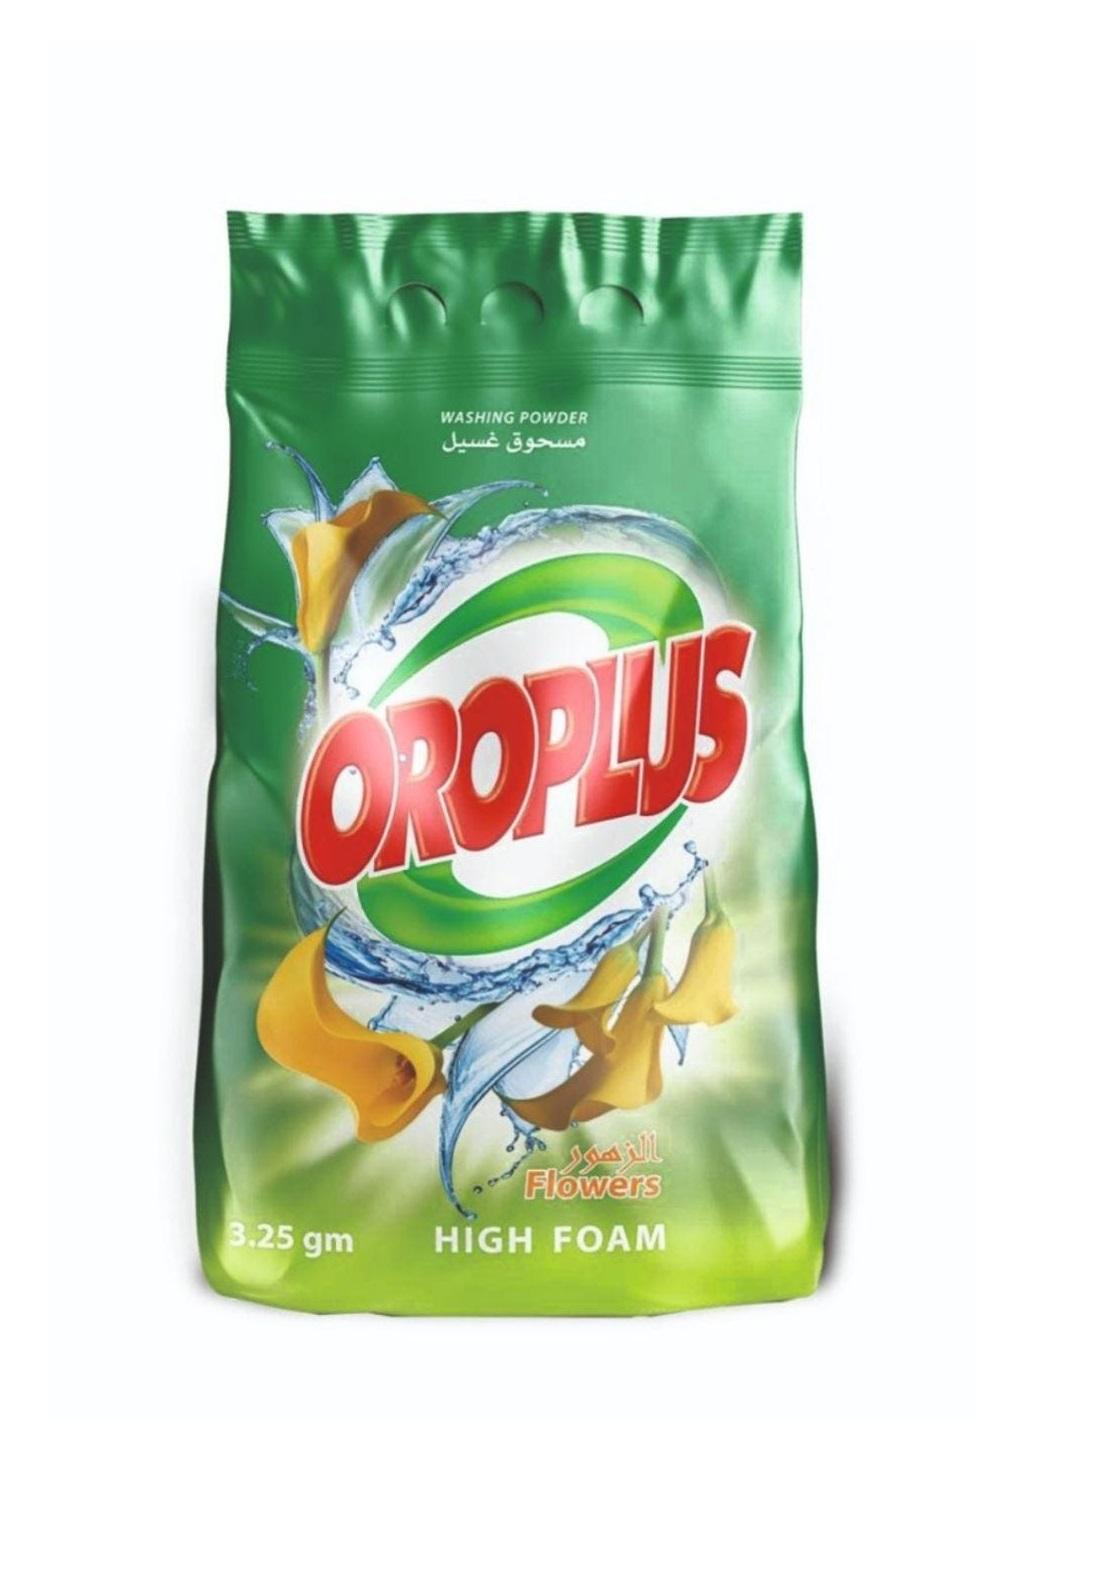 Oroplus washing powder 3.25kg  مسحوق غسيل اوروبلاس اخضر 3.25كغم